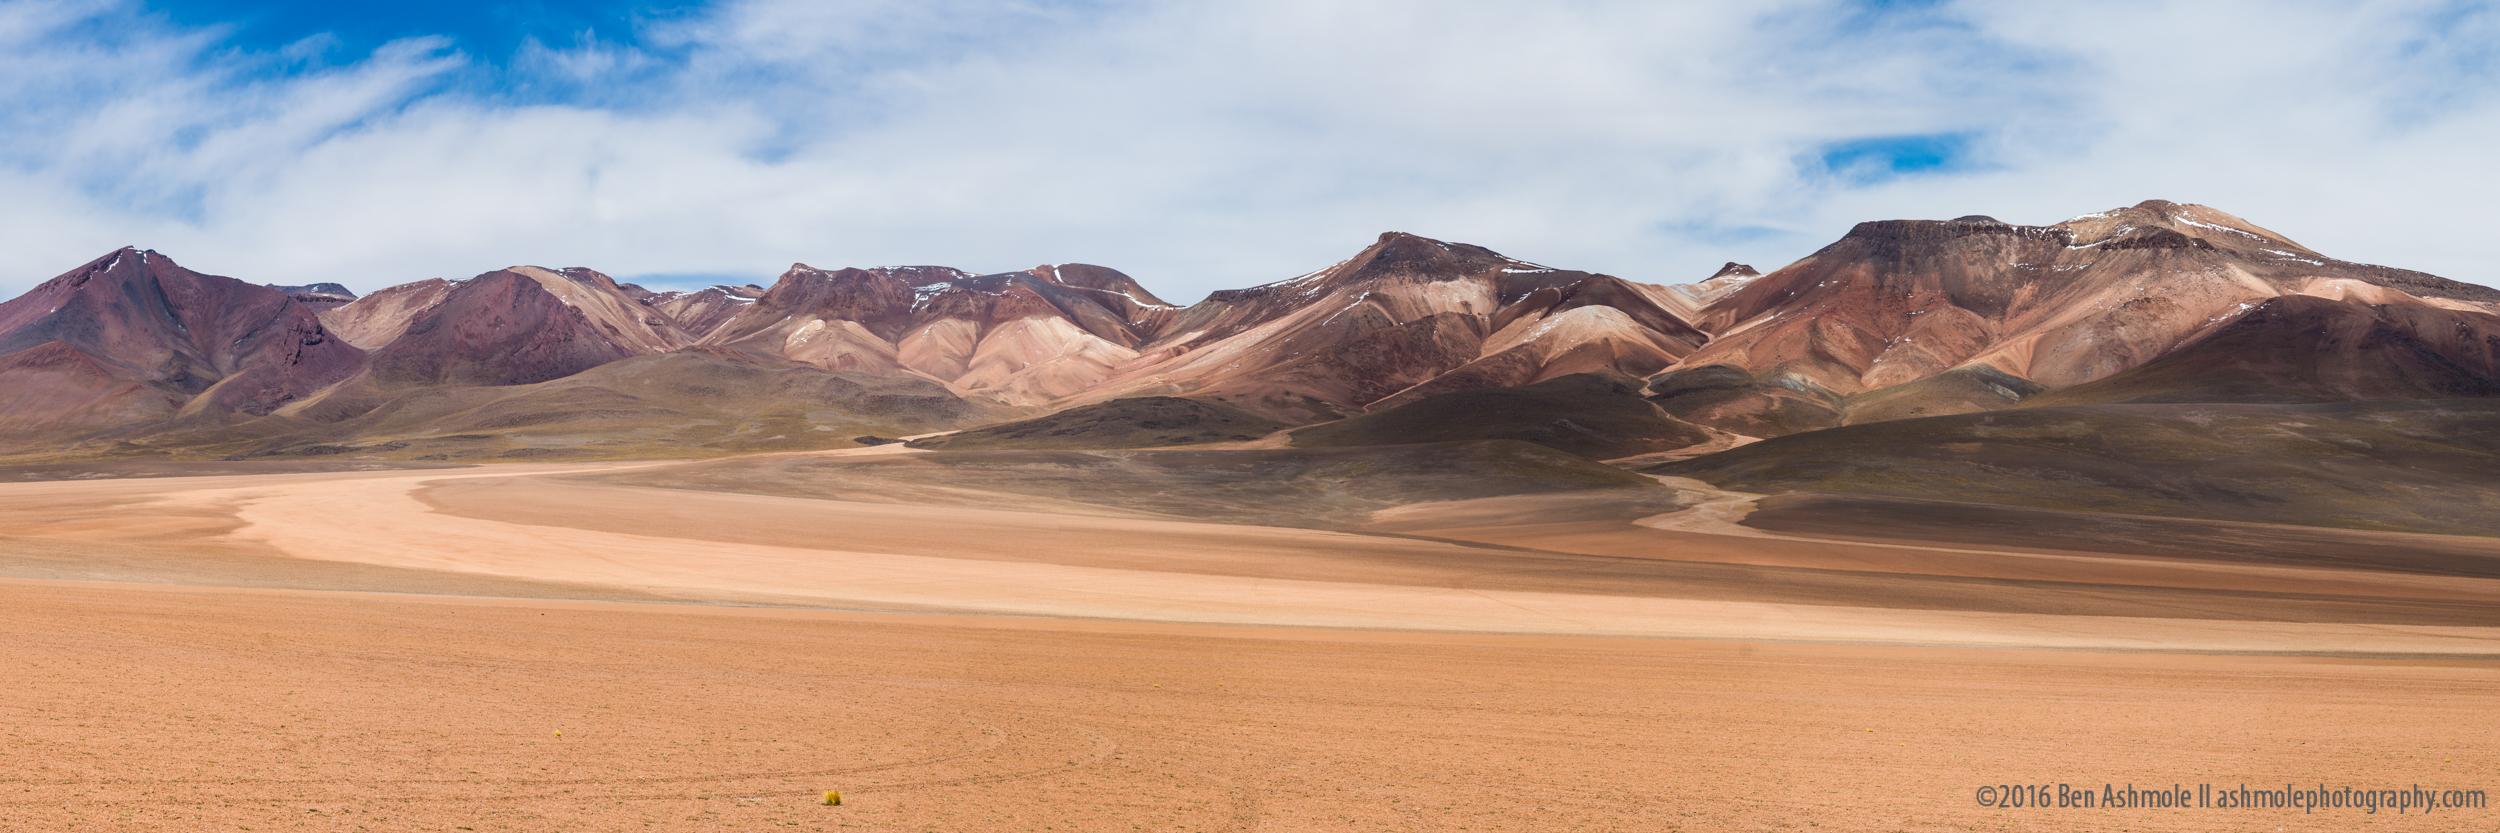 Desert Mountain Panorama, Bolivian Highlands